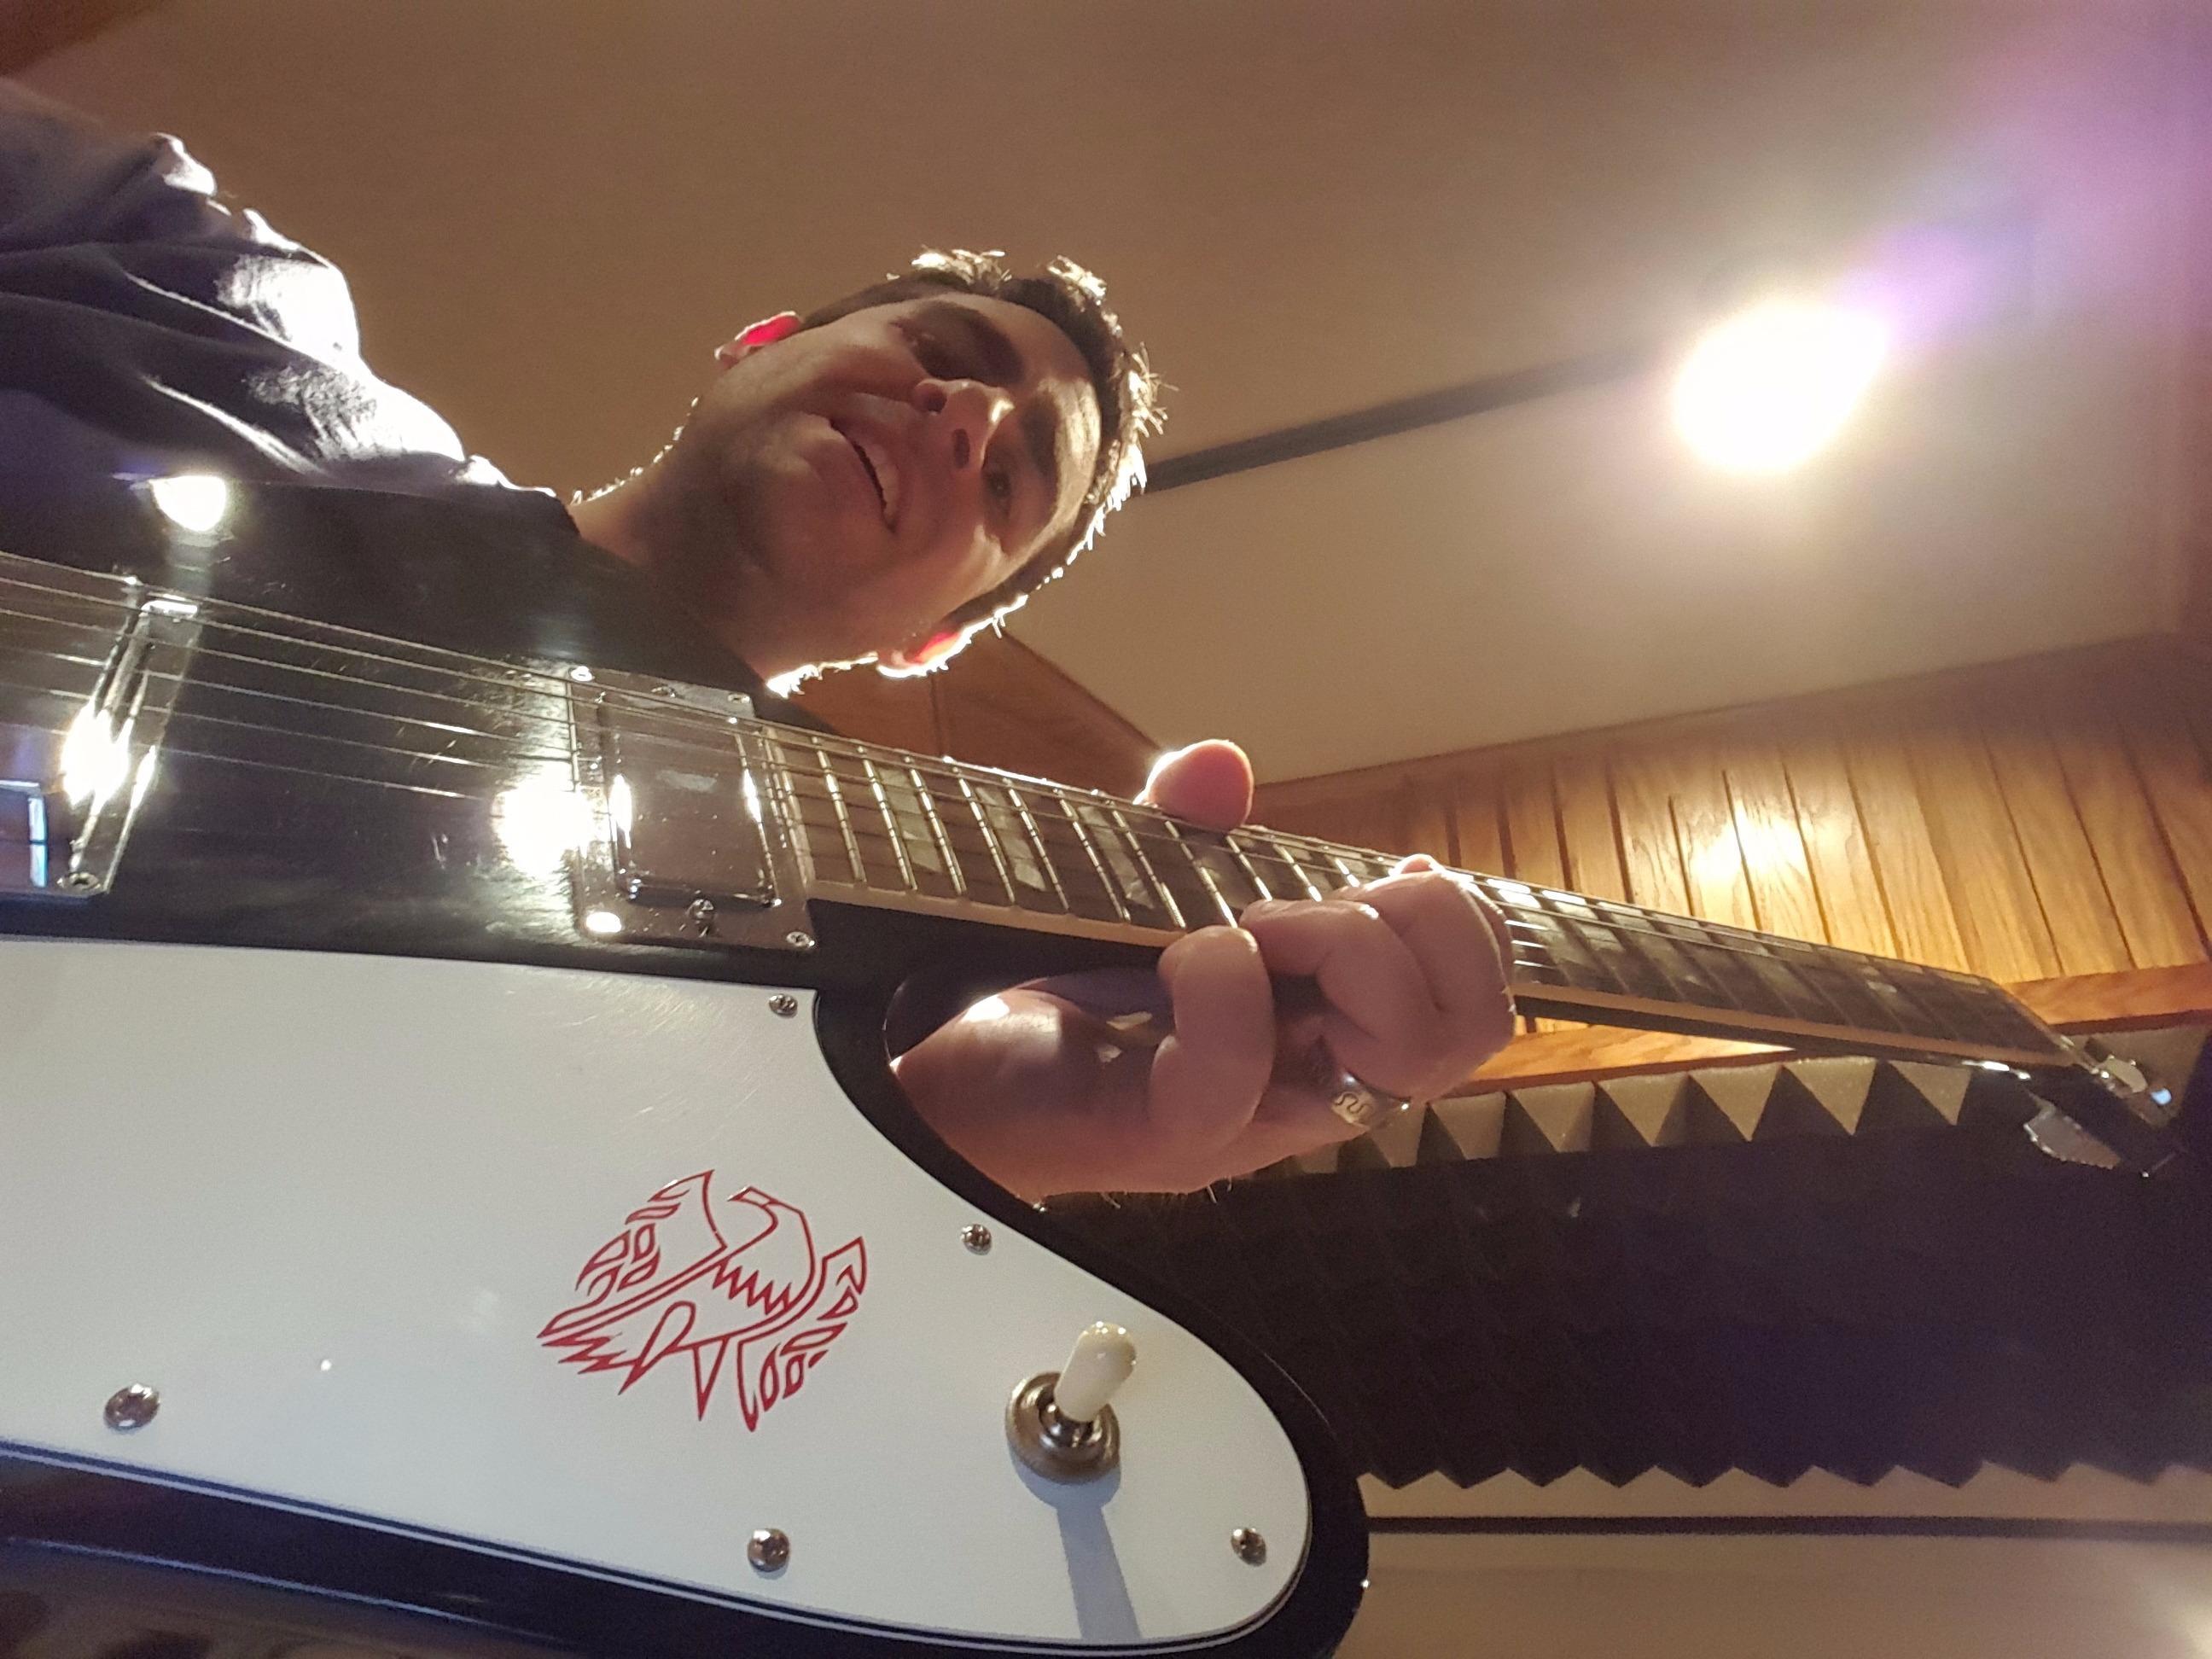 BUSINESS NEWS: COMBO Member Denver School of Rock Shares Important News